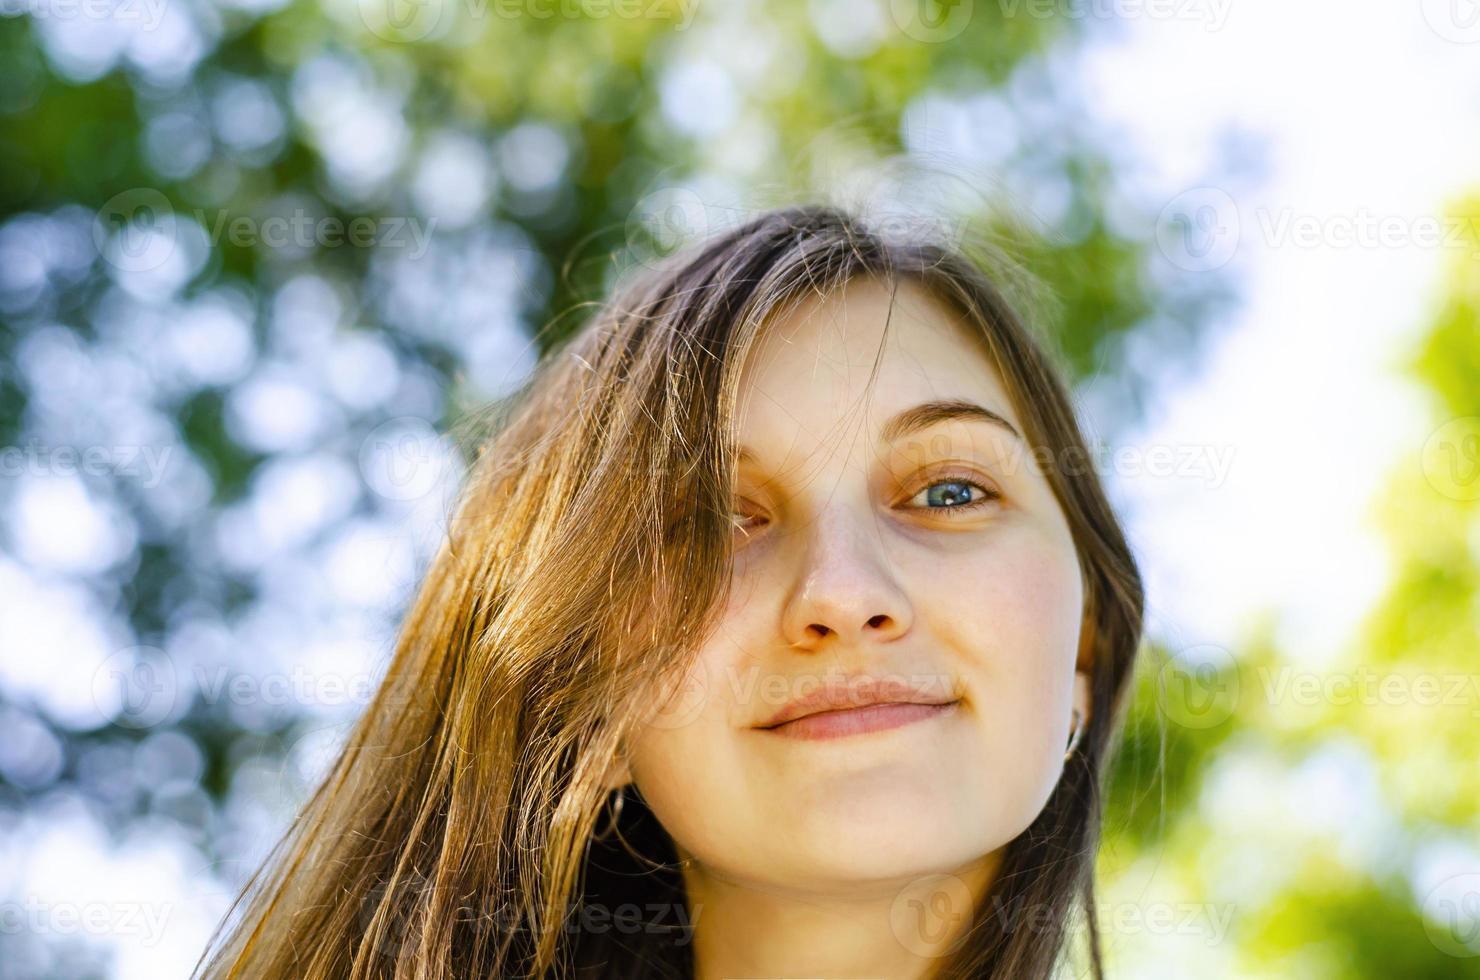 hermosa chica, cabello castaño. sonríe. bosque, verano. foto